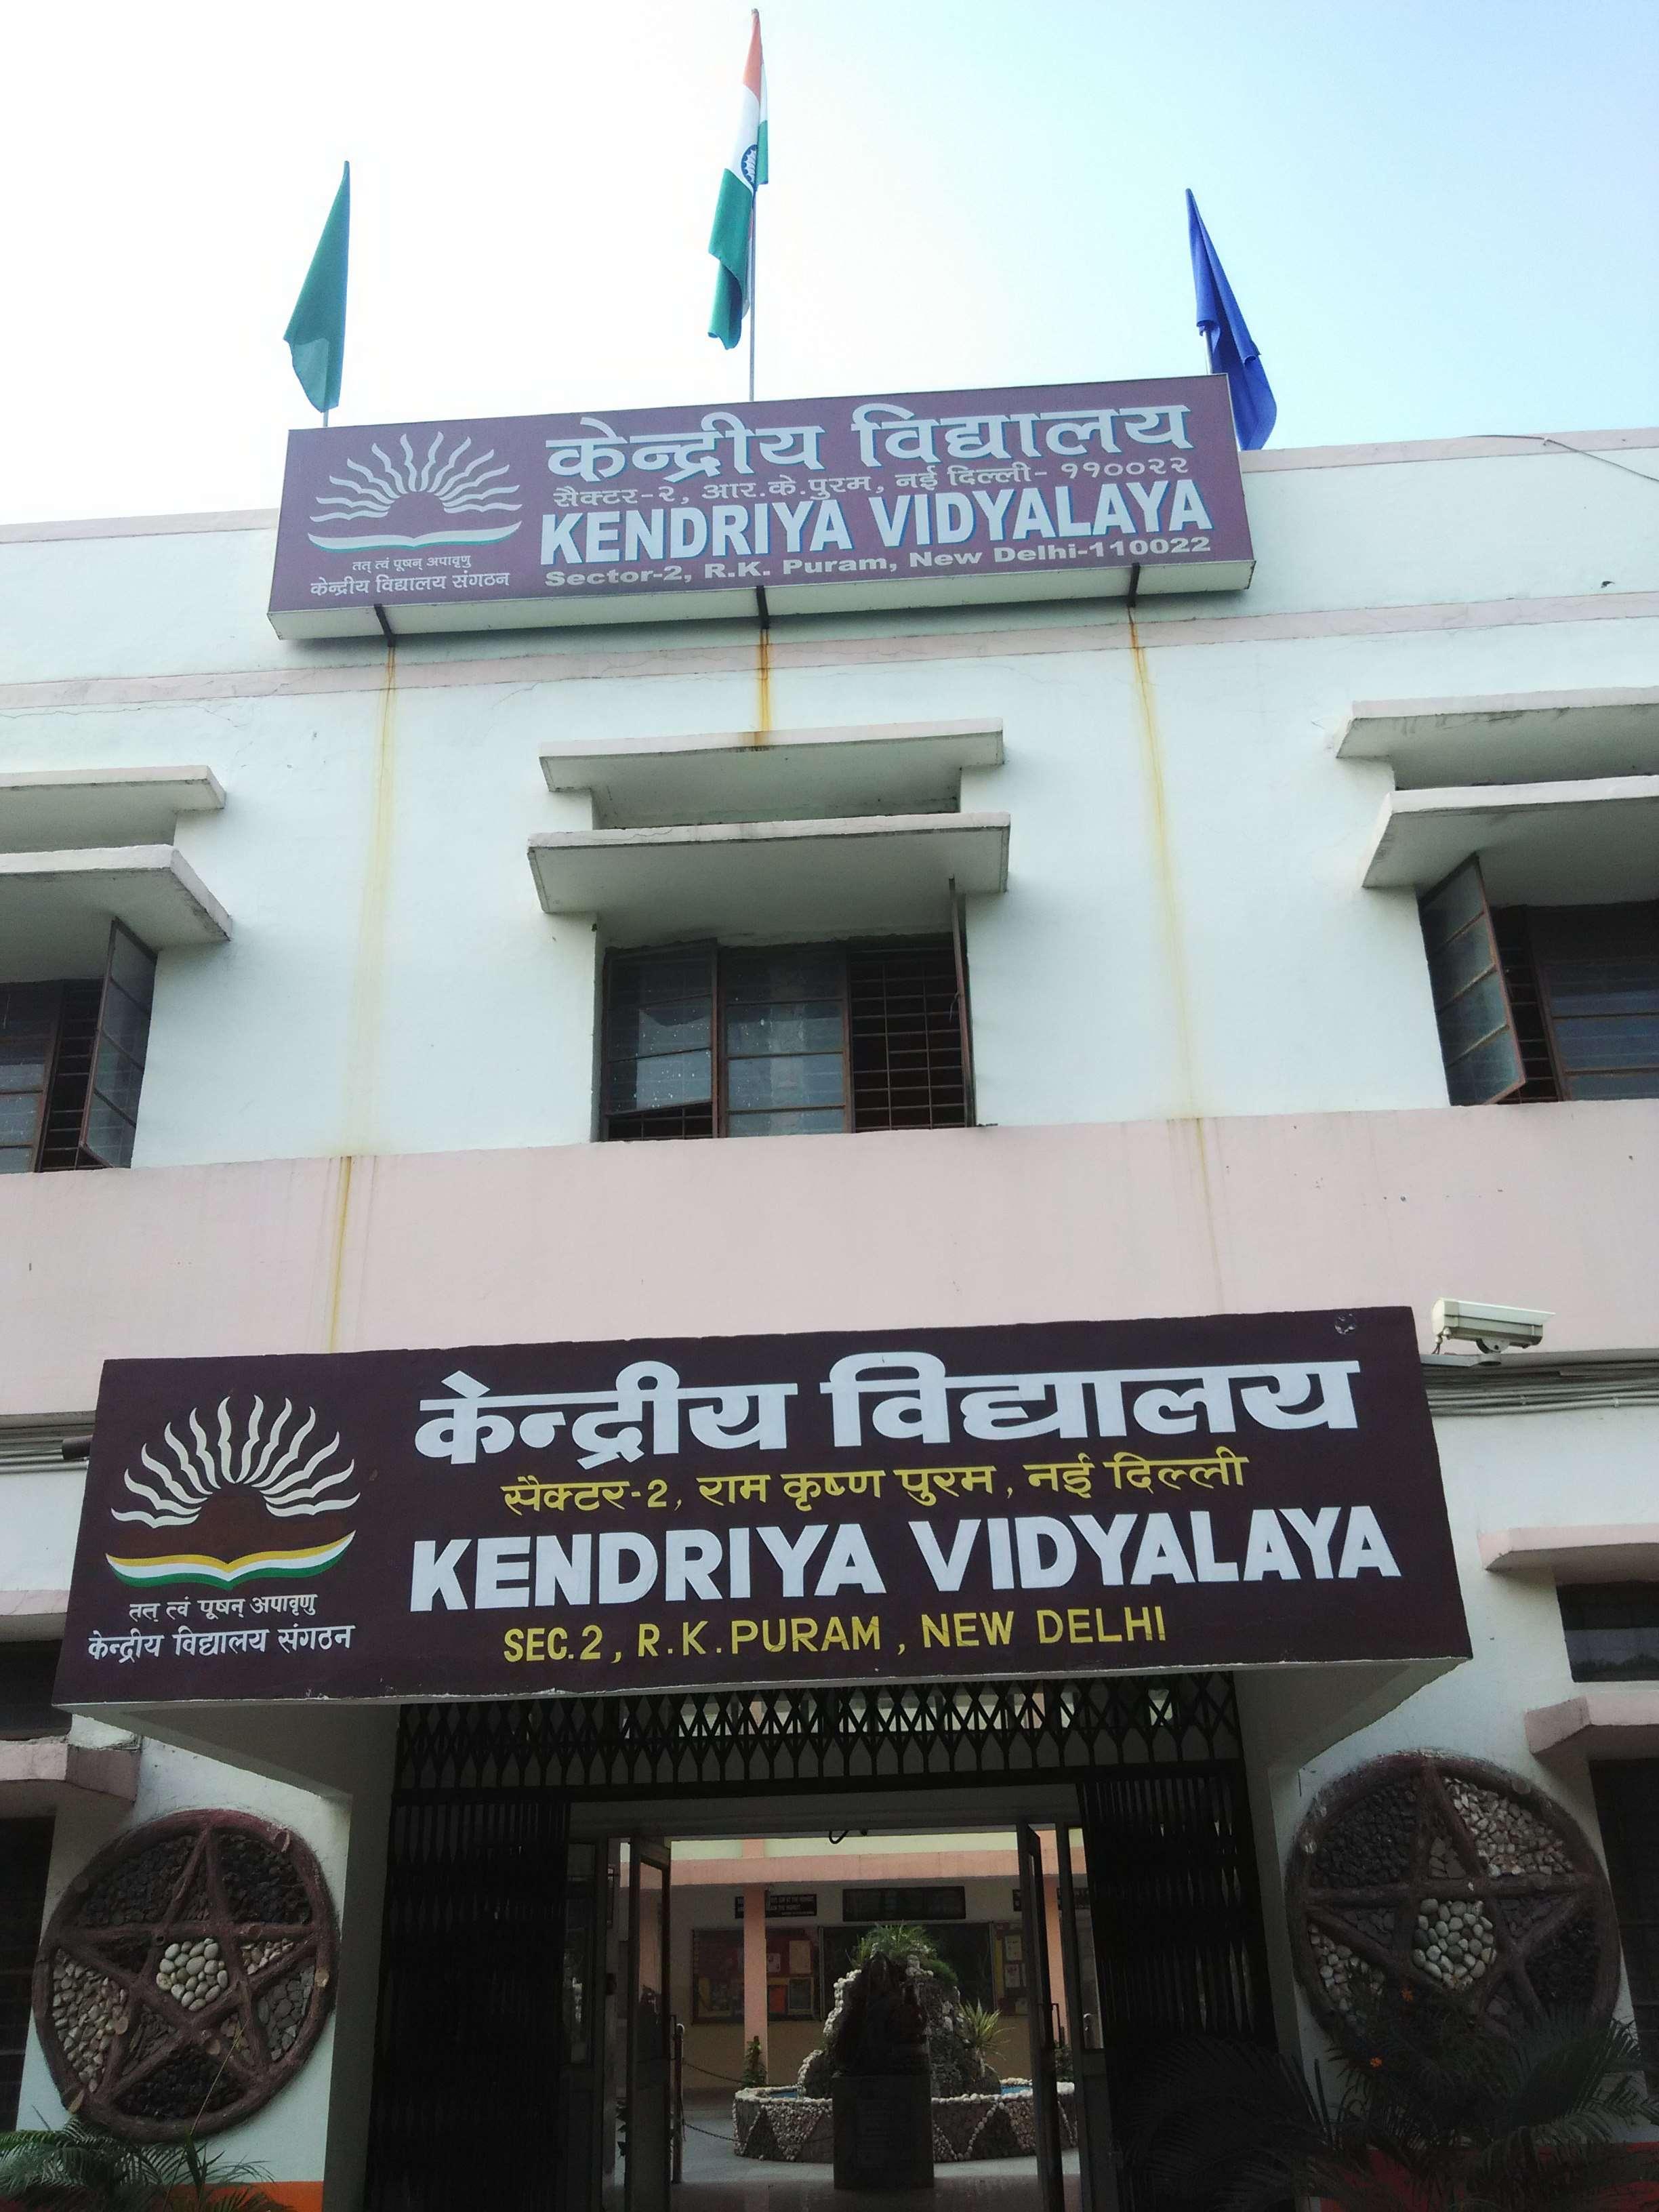 KENDRIYA VIDYALAYA SECTOR II R K PURAM NEW DELHI 2700002